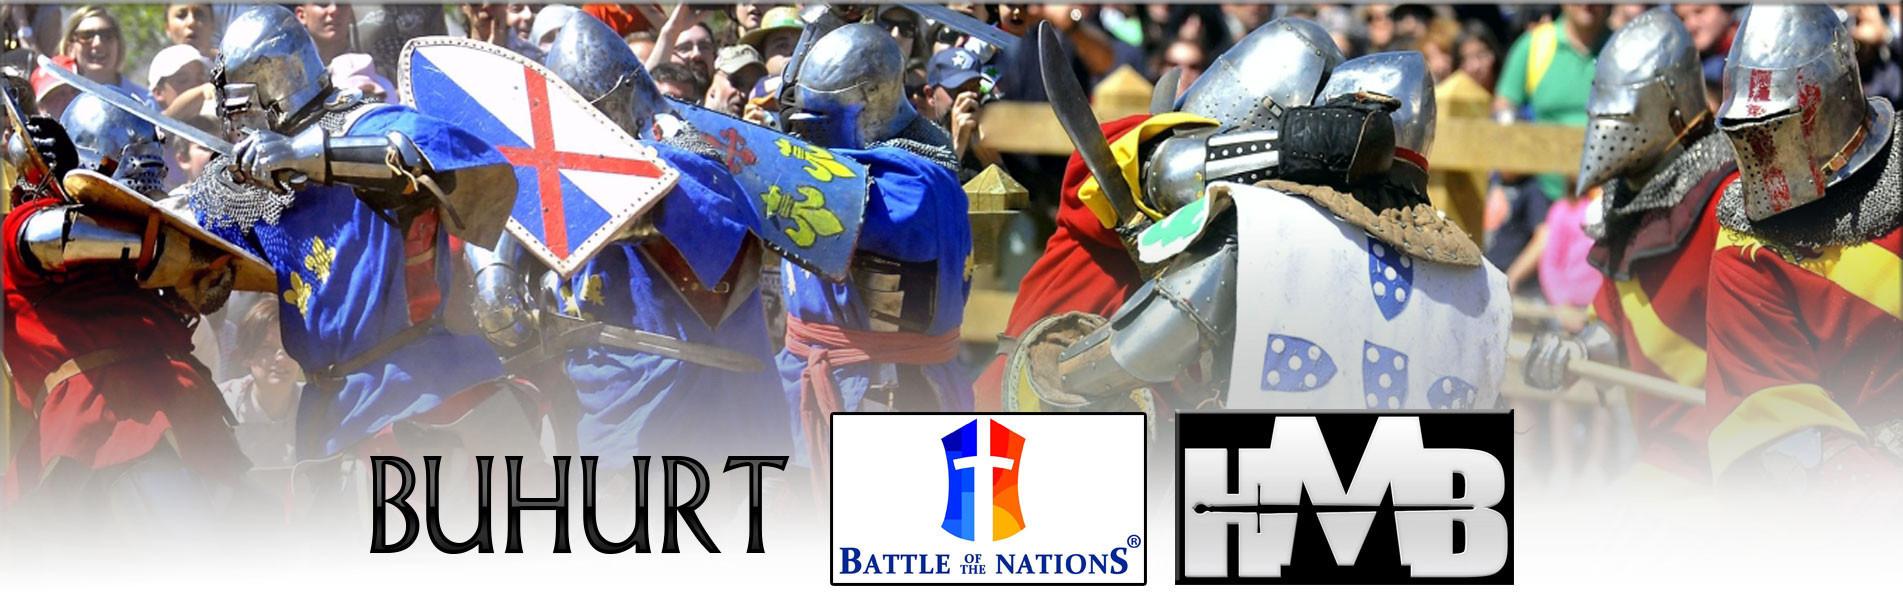 Mittelalterlicher Kampf Buhurt-HMB